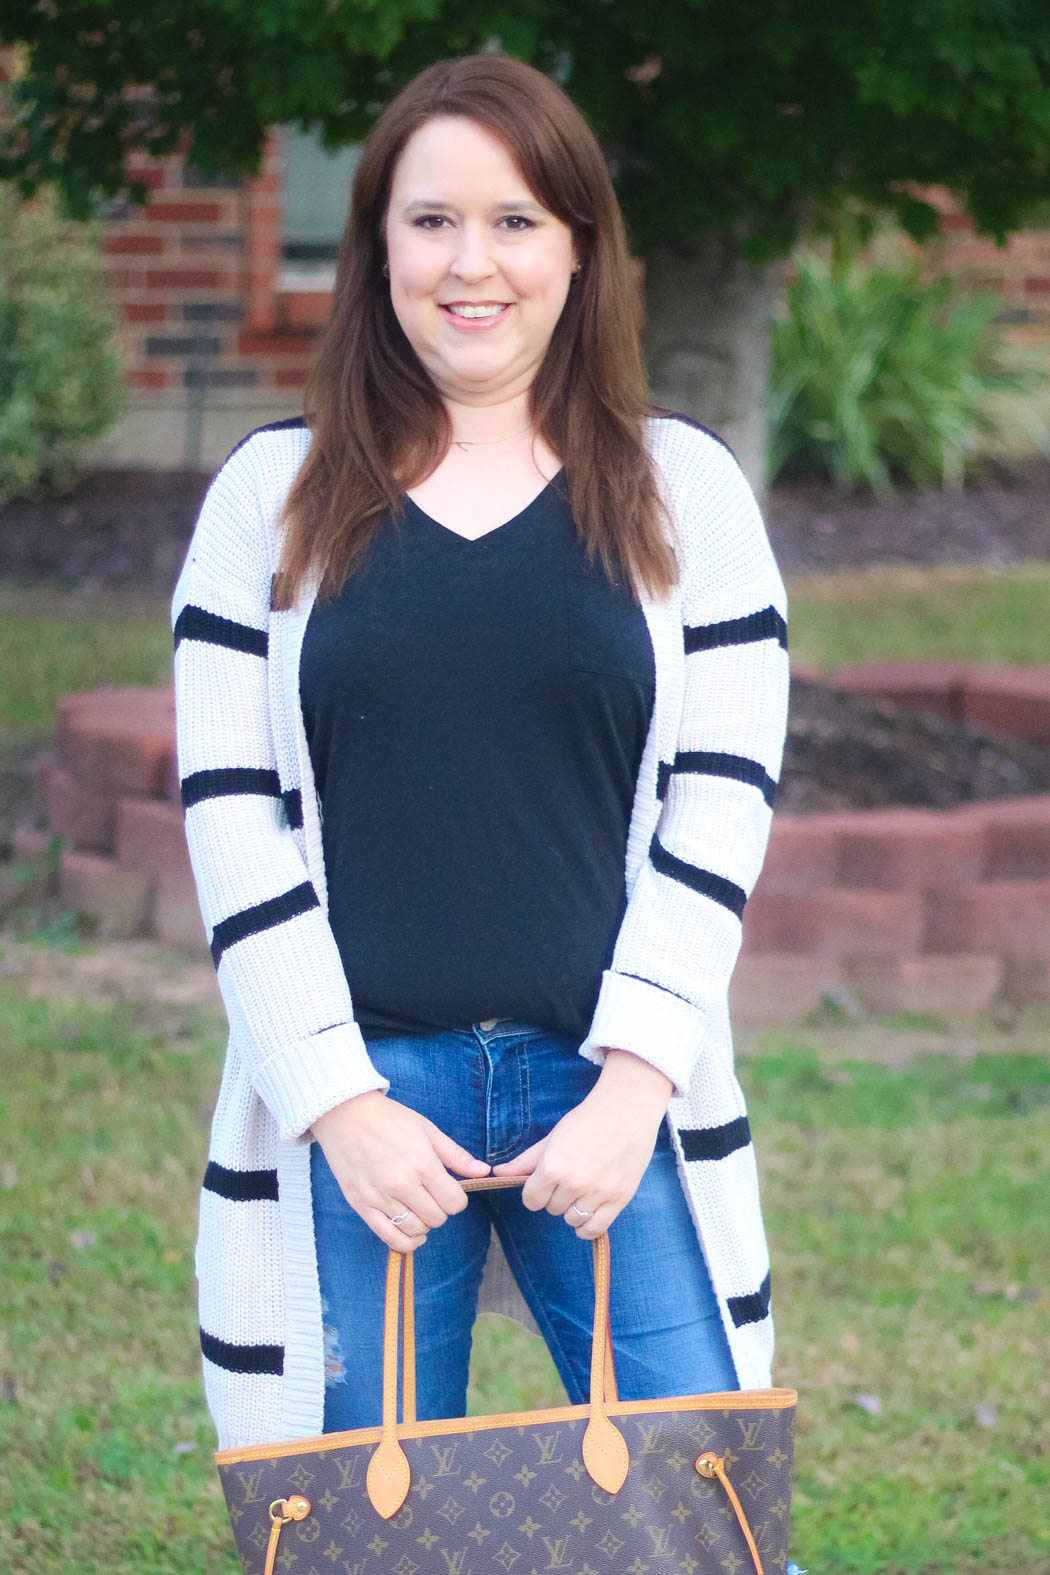 striped-cardigan-madewell-tee-ag-jeans-7